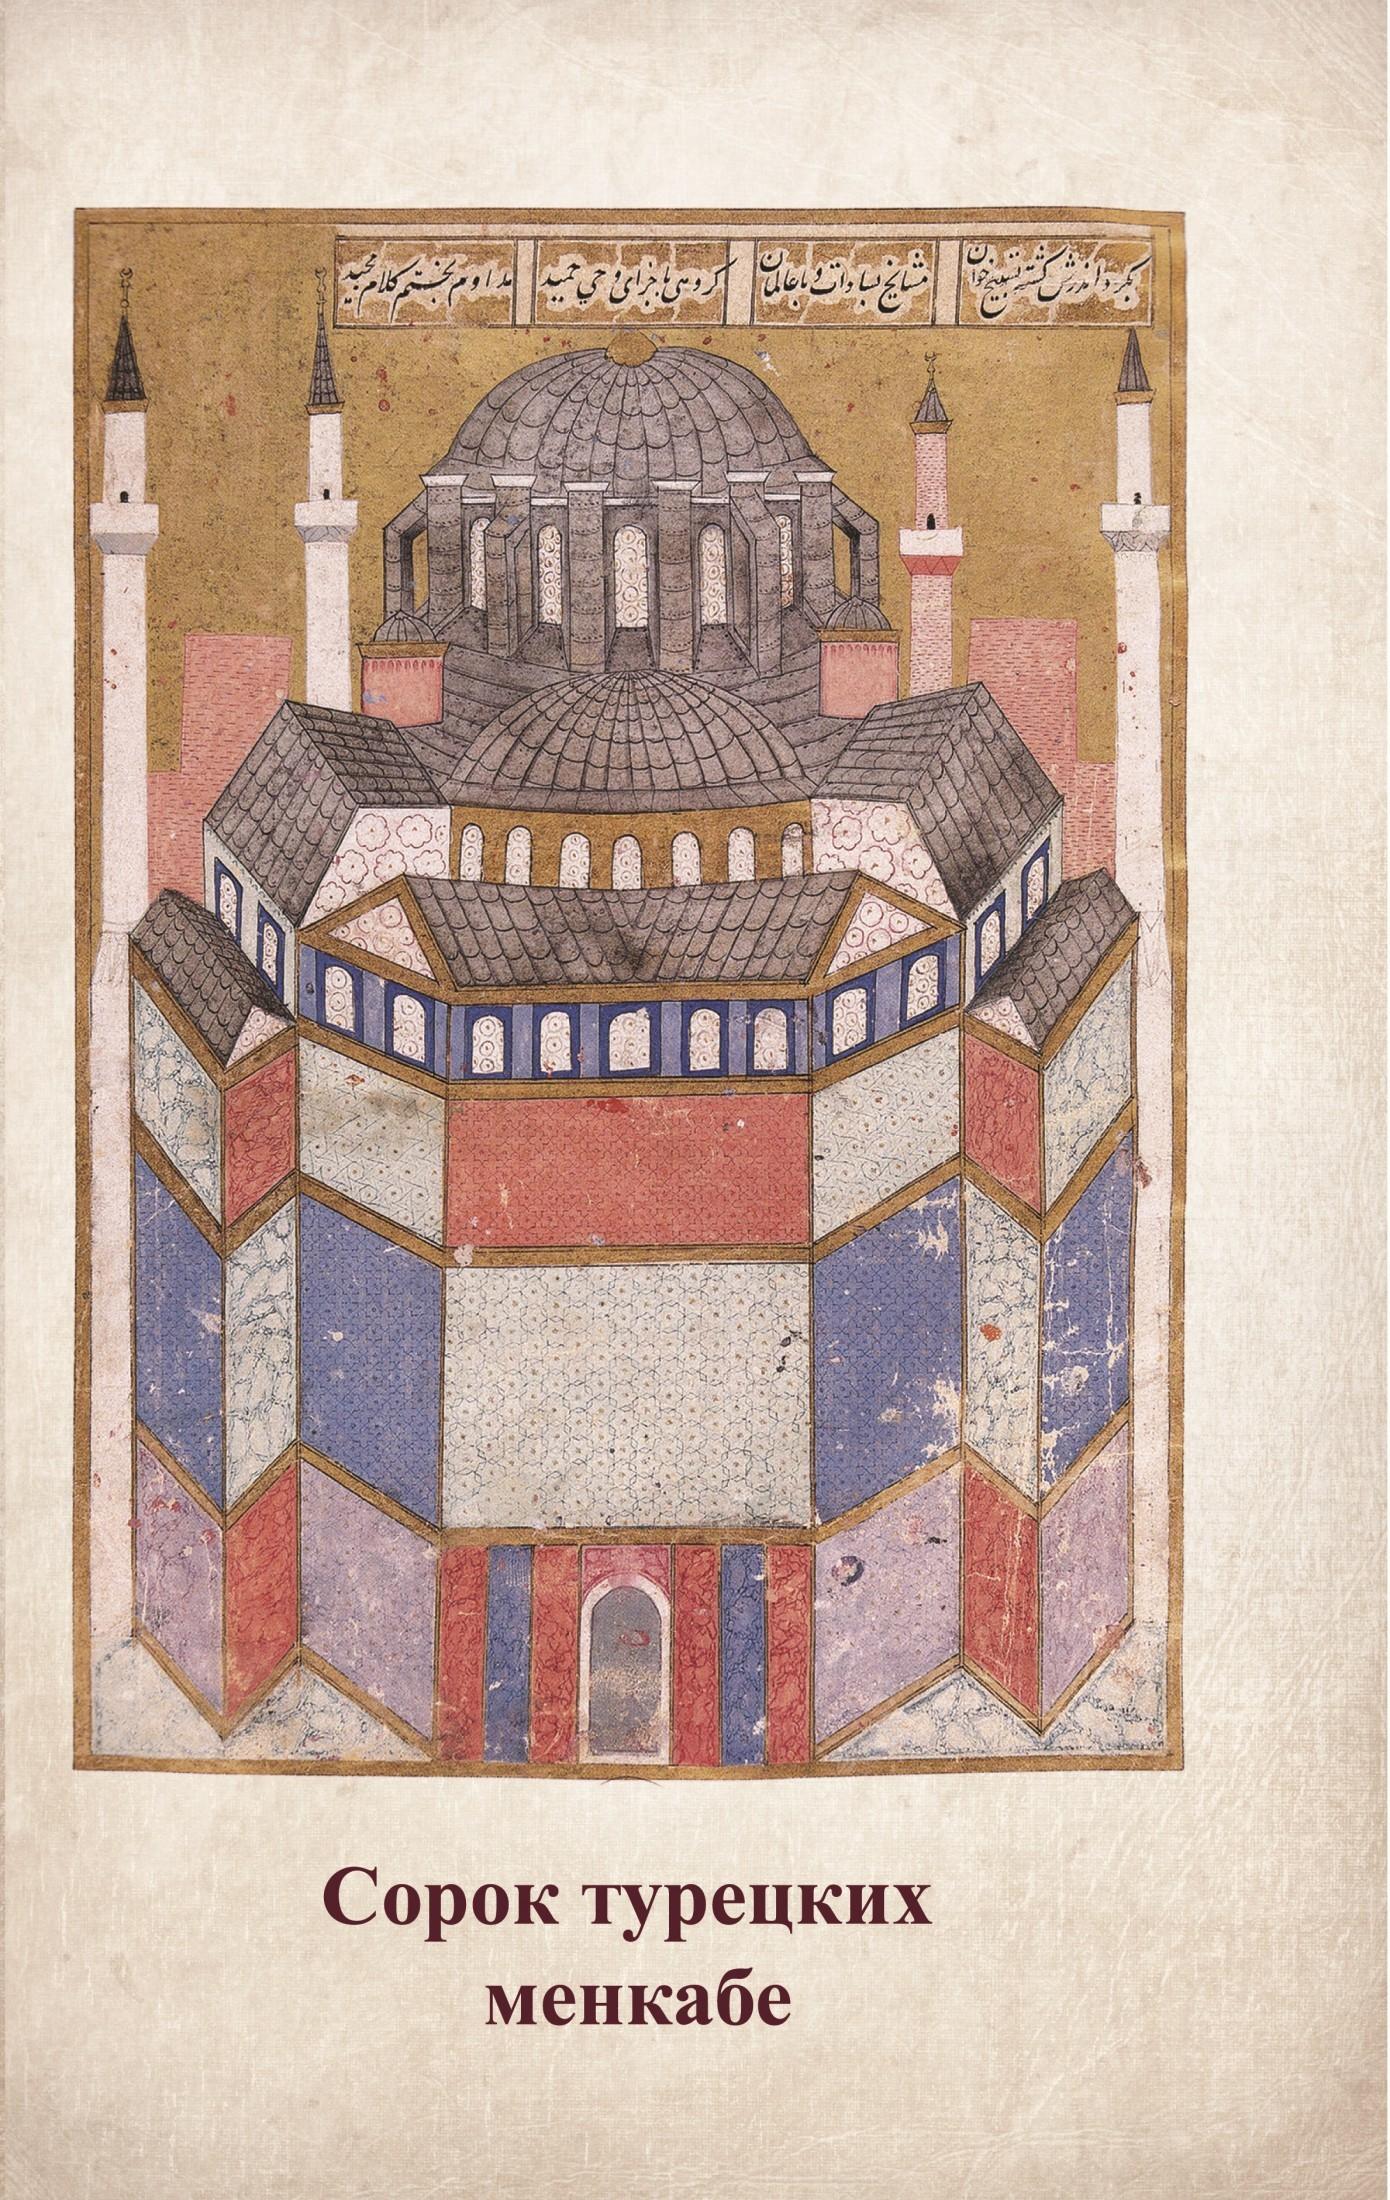 Сорок турецких менкабе